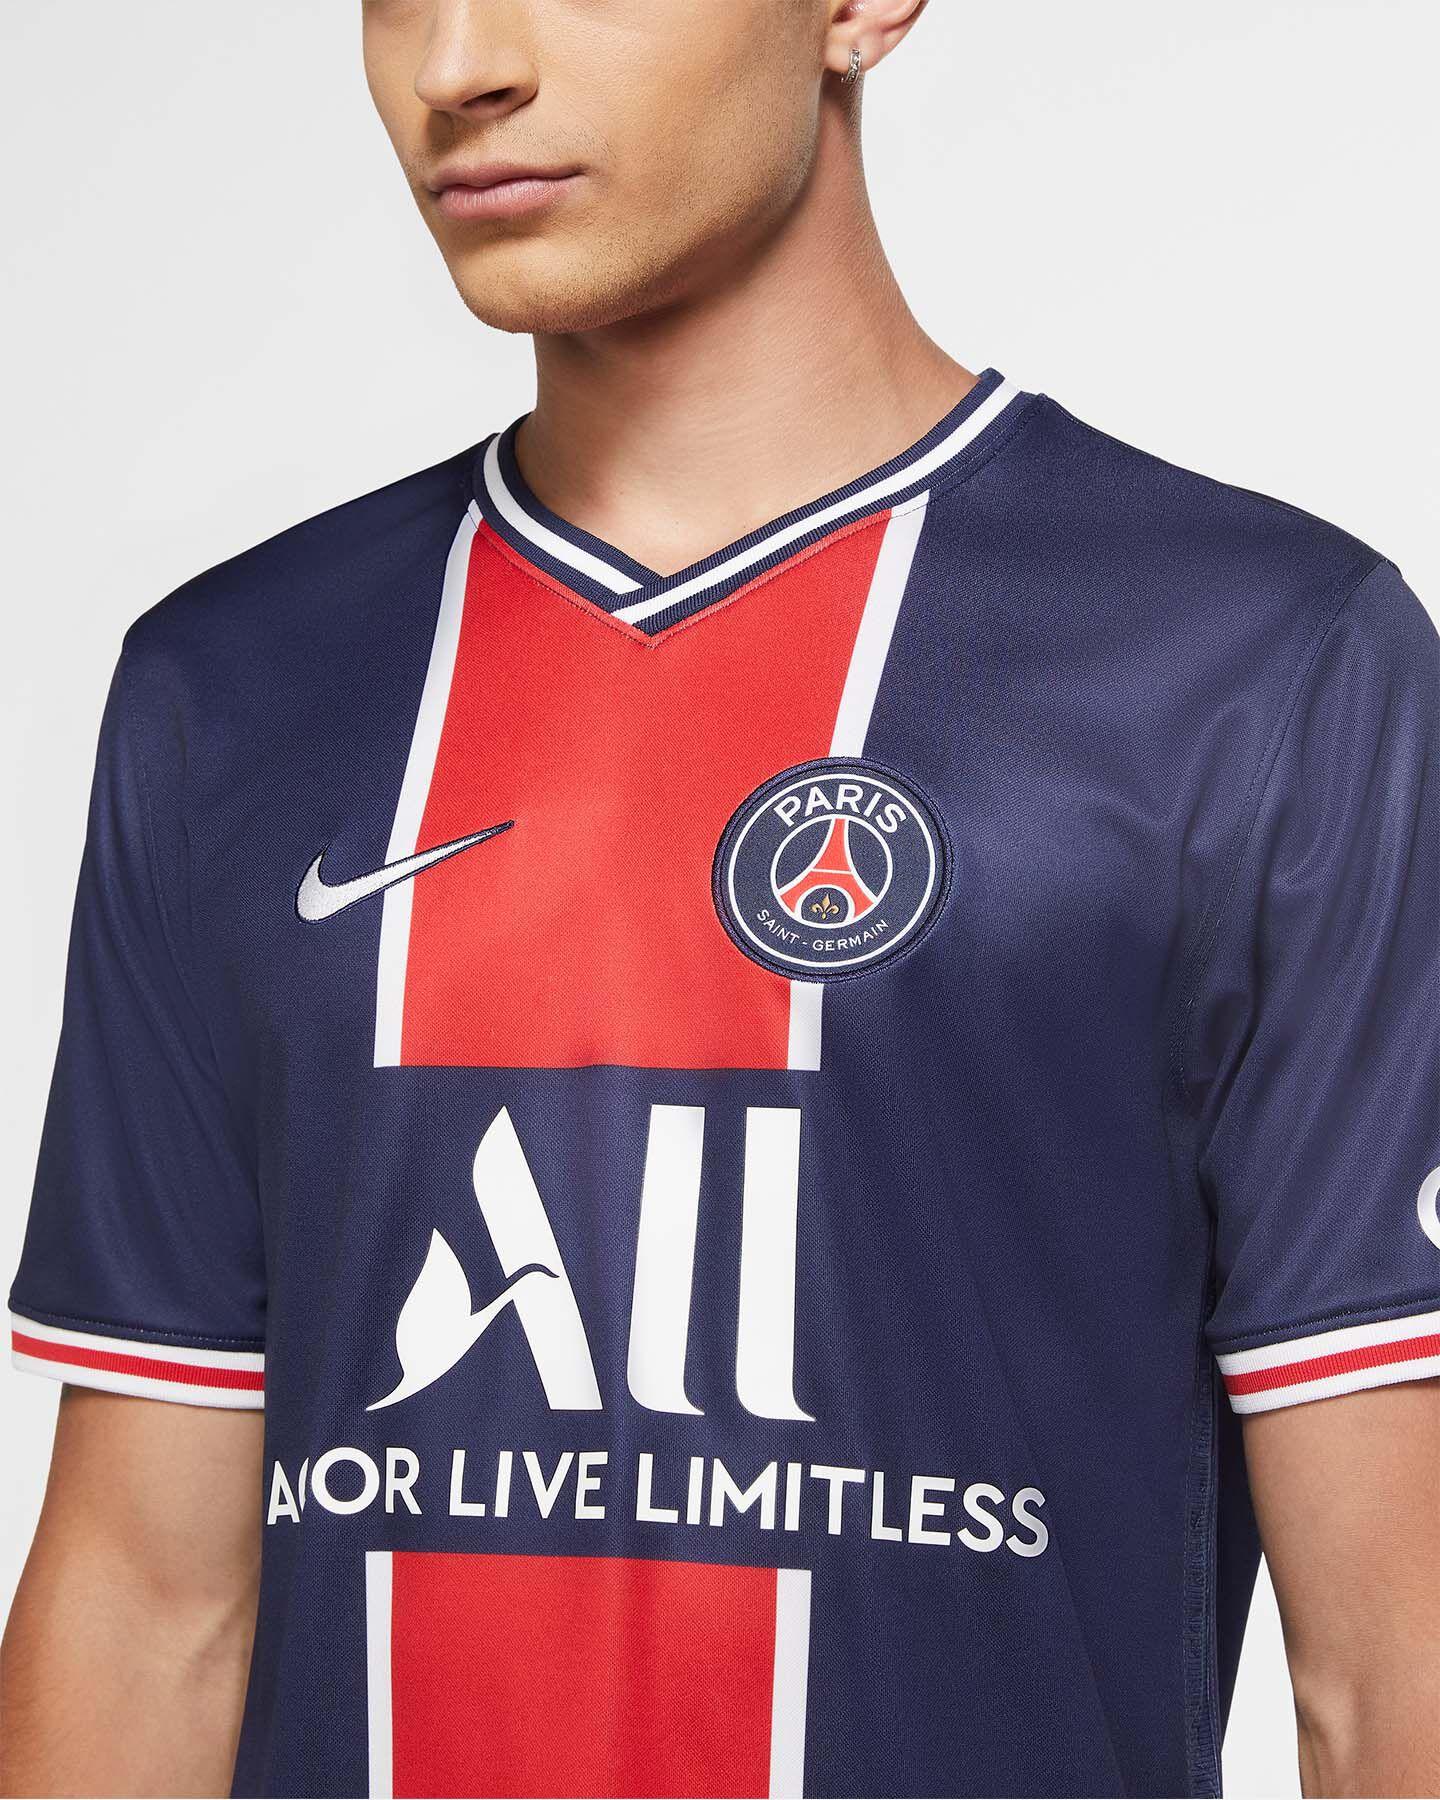 Maglia Calcio Nike Paris Saint-germain Home 20-21 M CD4242-411 ...